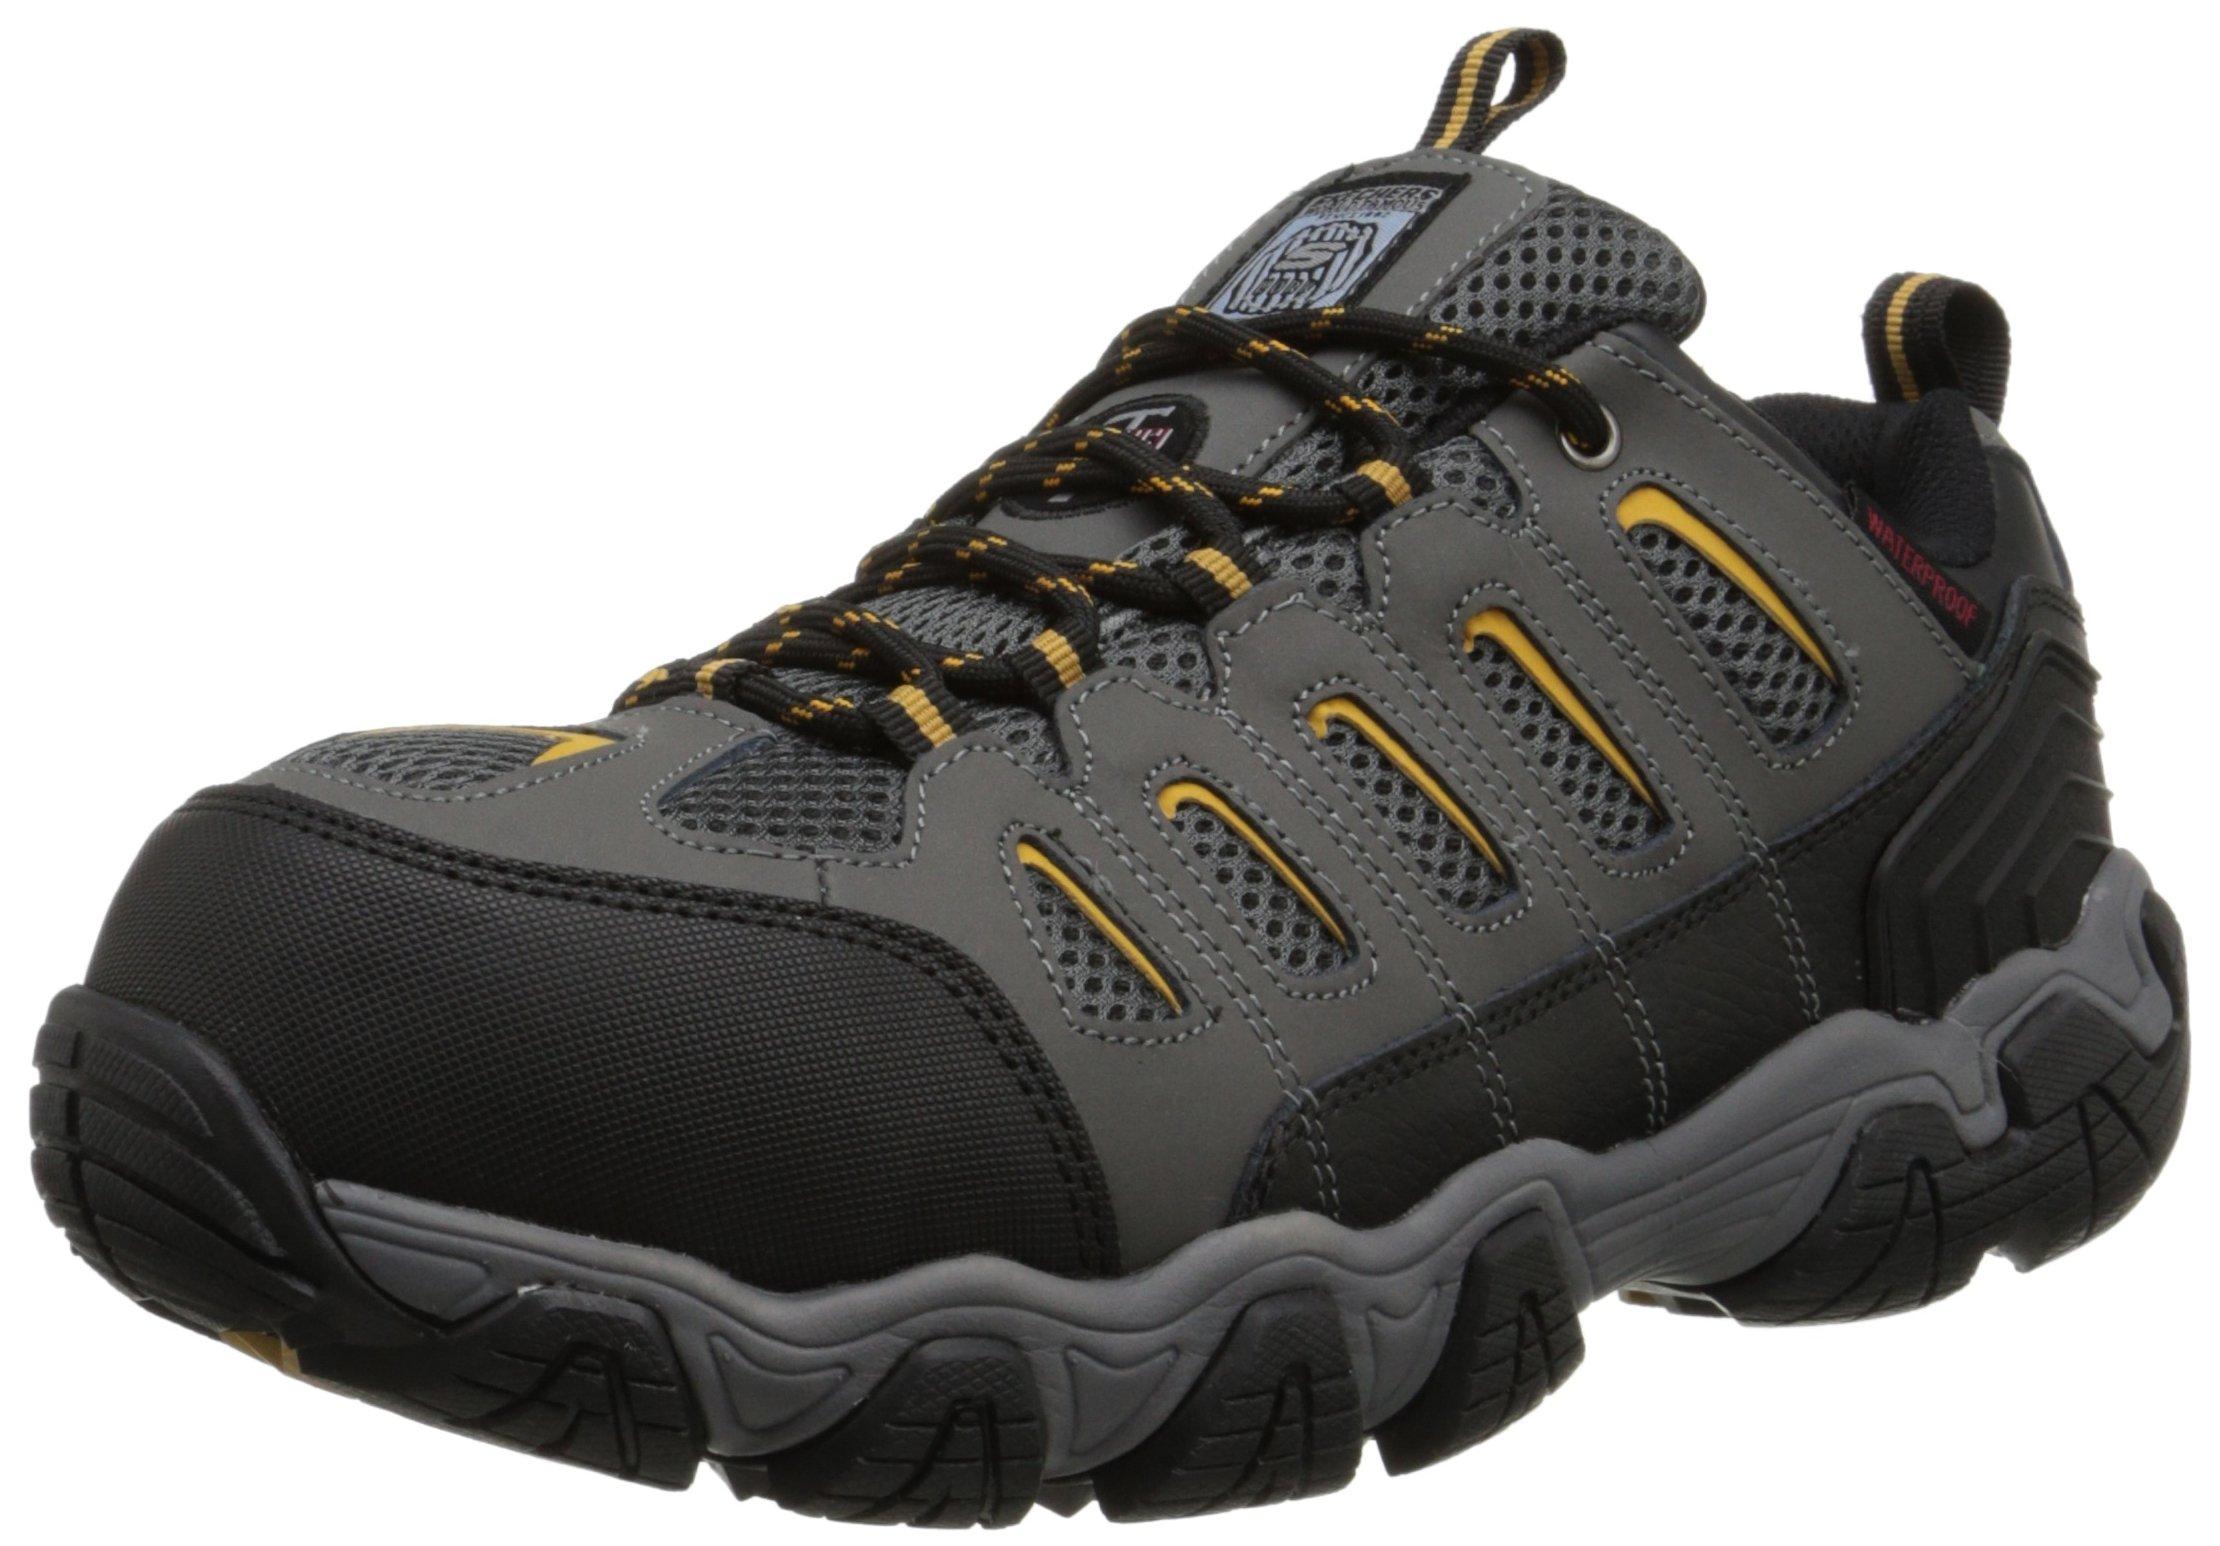 Skechers for Work Men's Blais Hiking Shoe, Dark Gray, 9.5 M US by Skechers